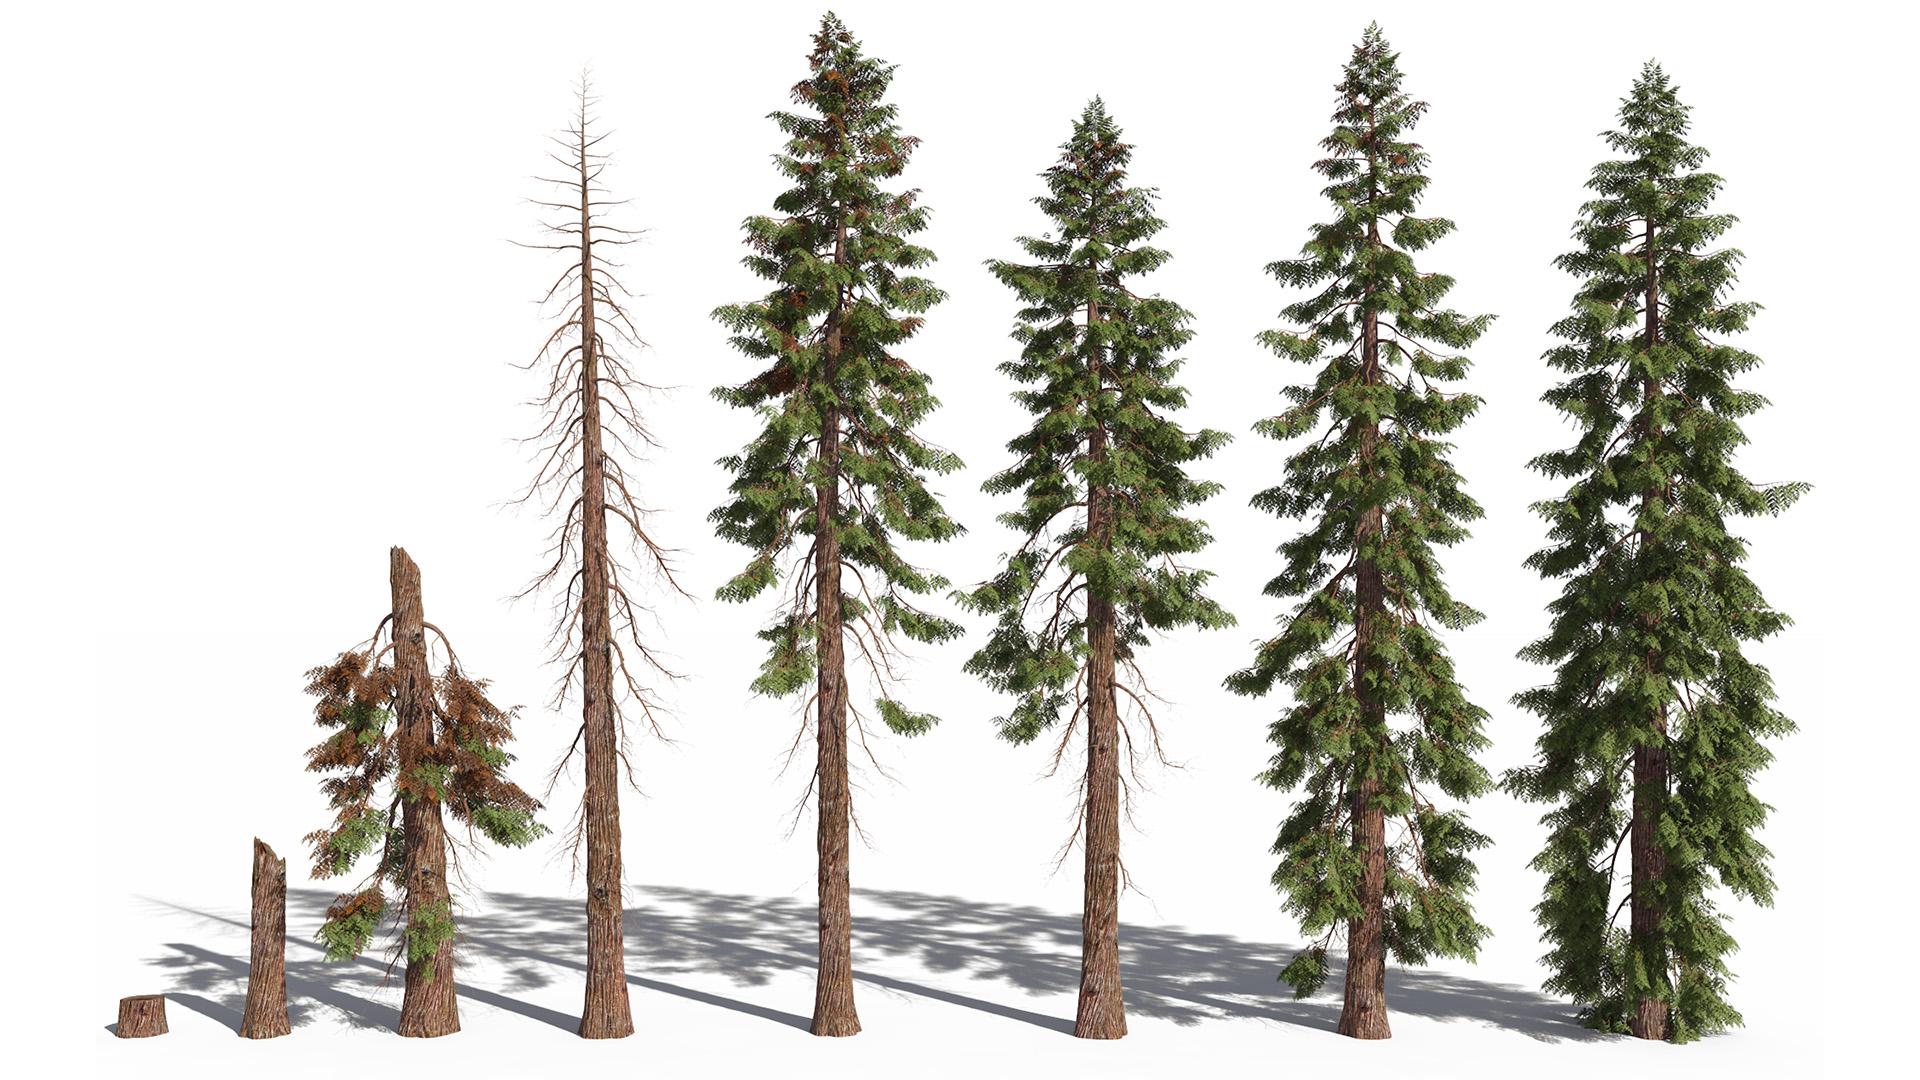 3D model of the Western red cedar Thuja plicata health variations